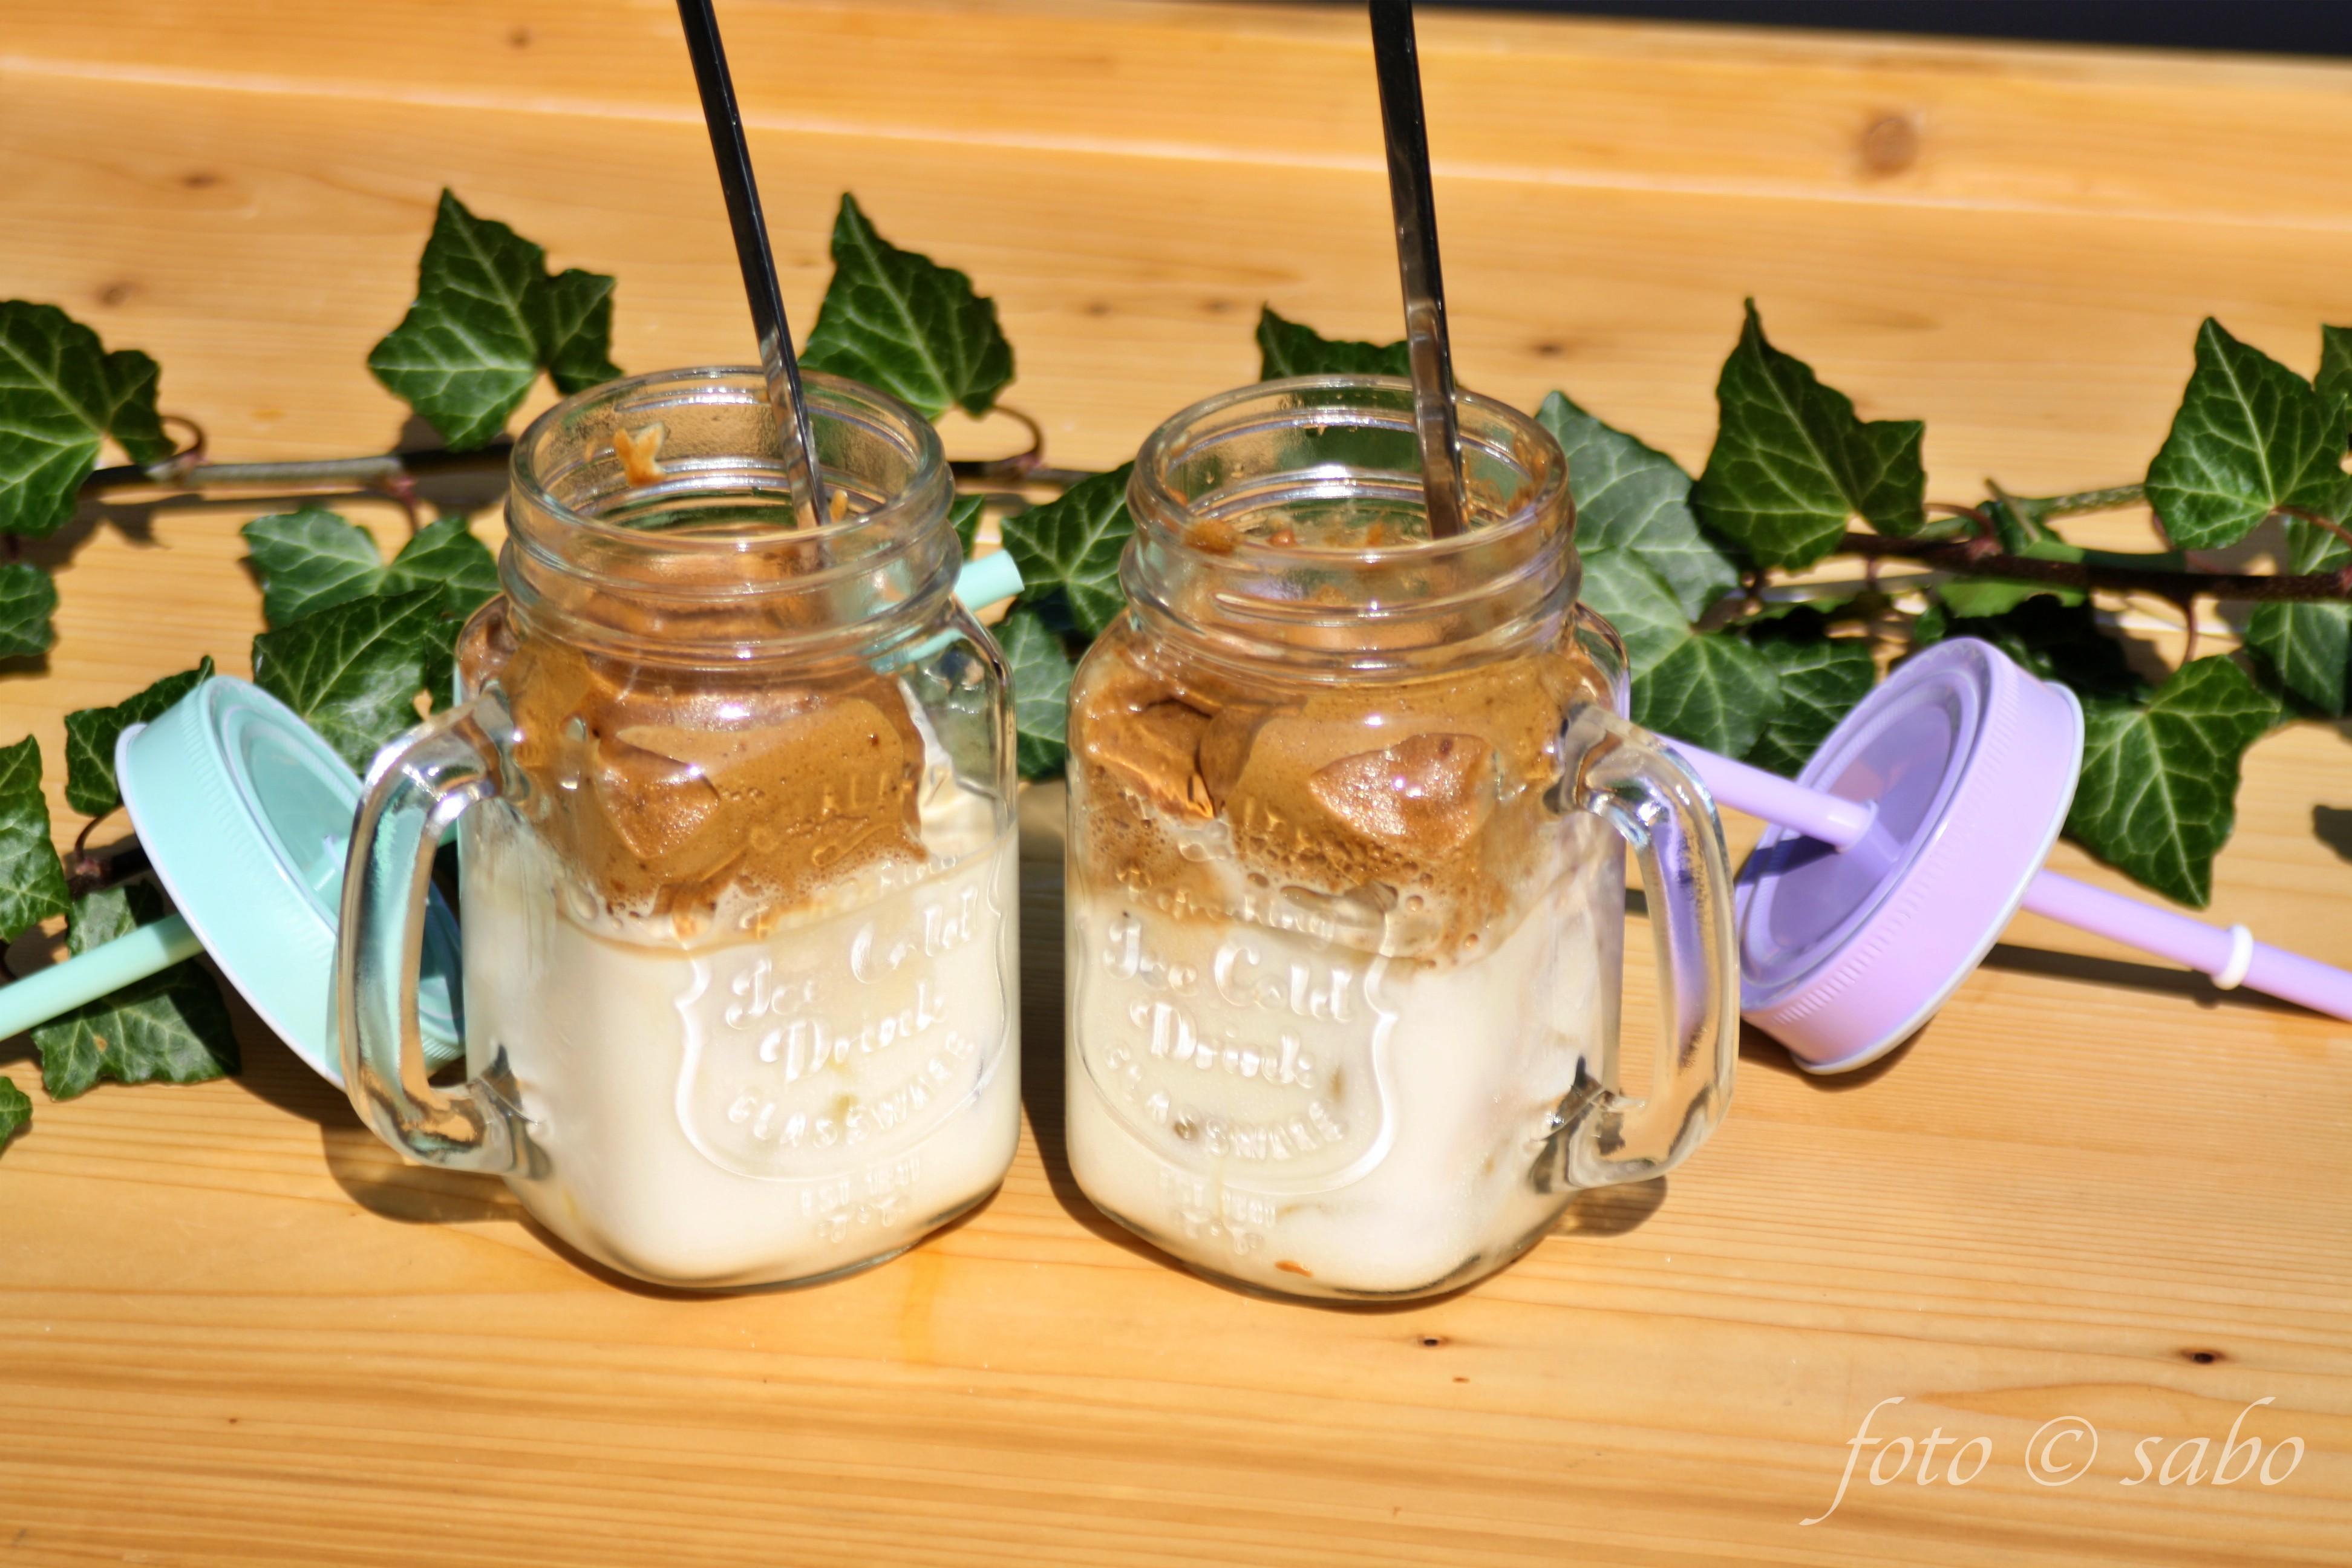 Dalgona Coffee / Whipped Coffee (Low Carb / Keto)